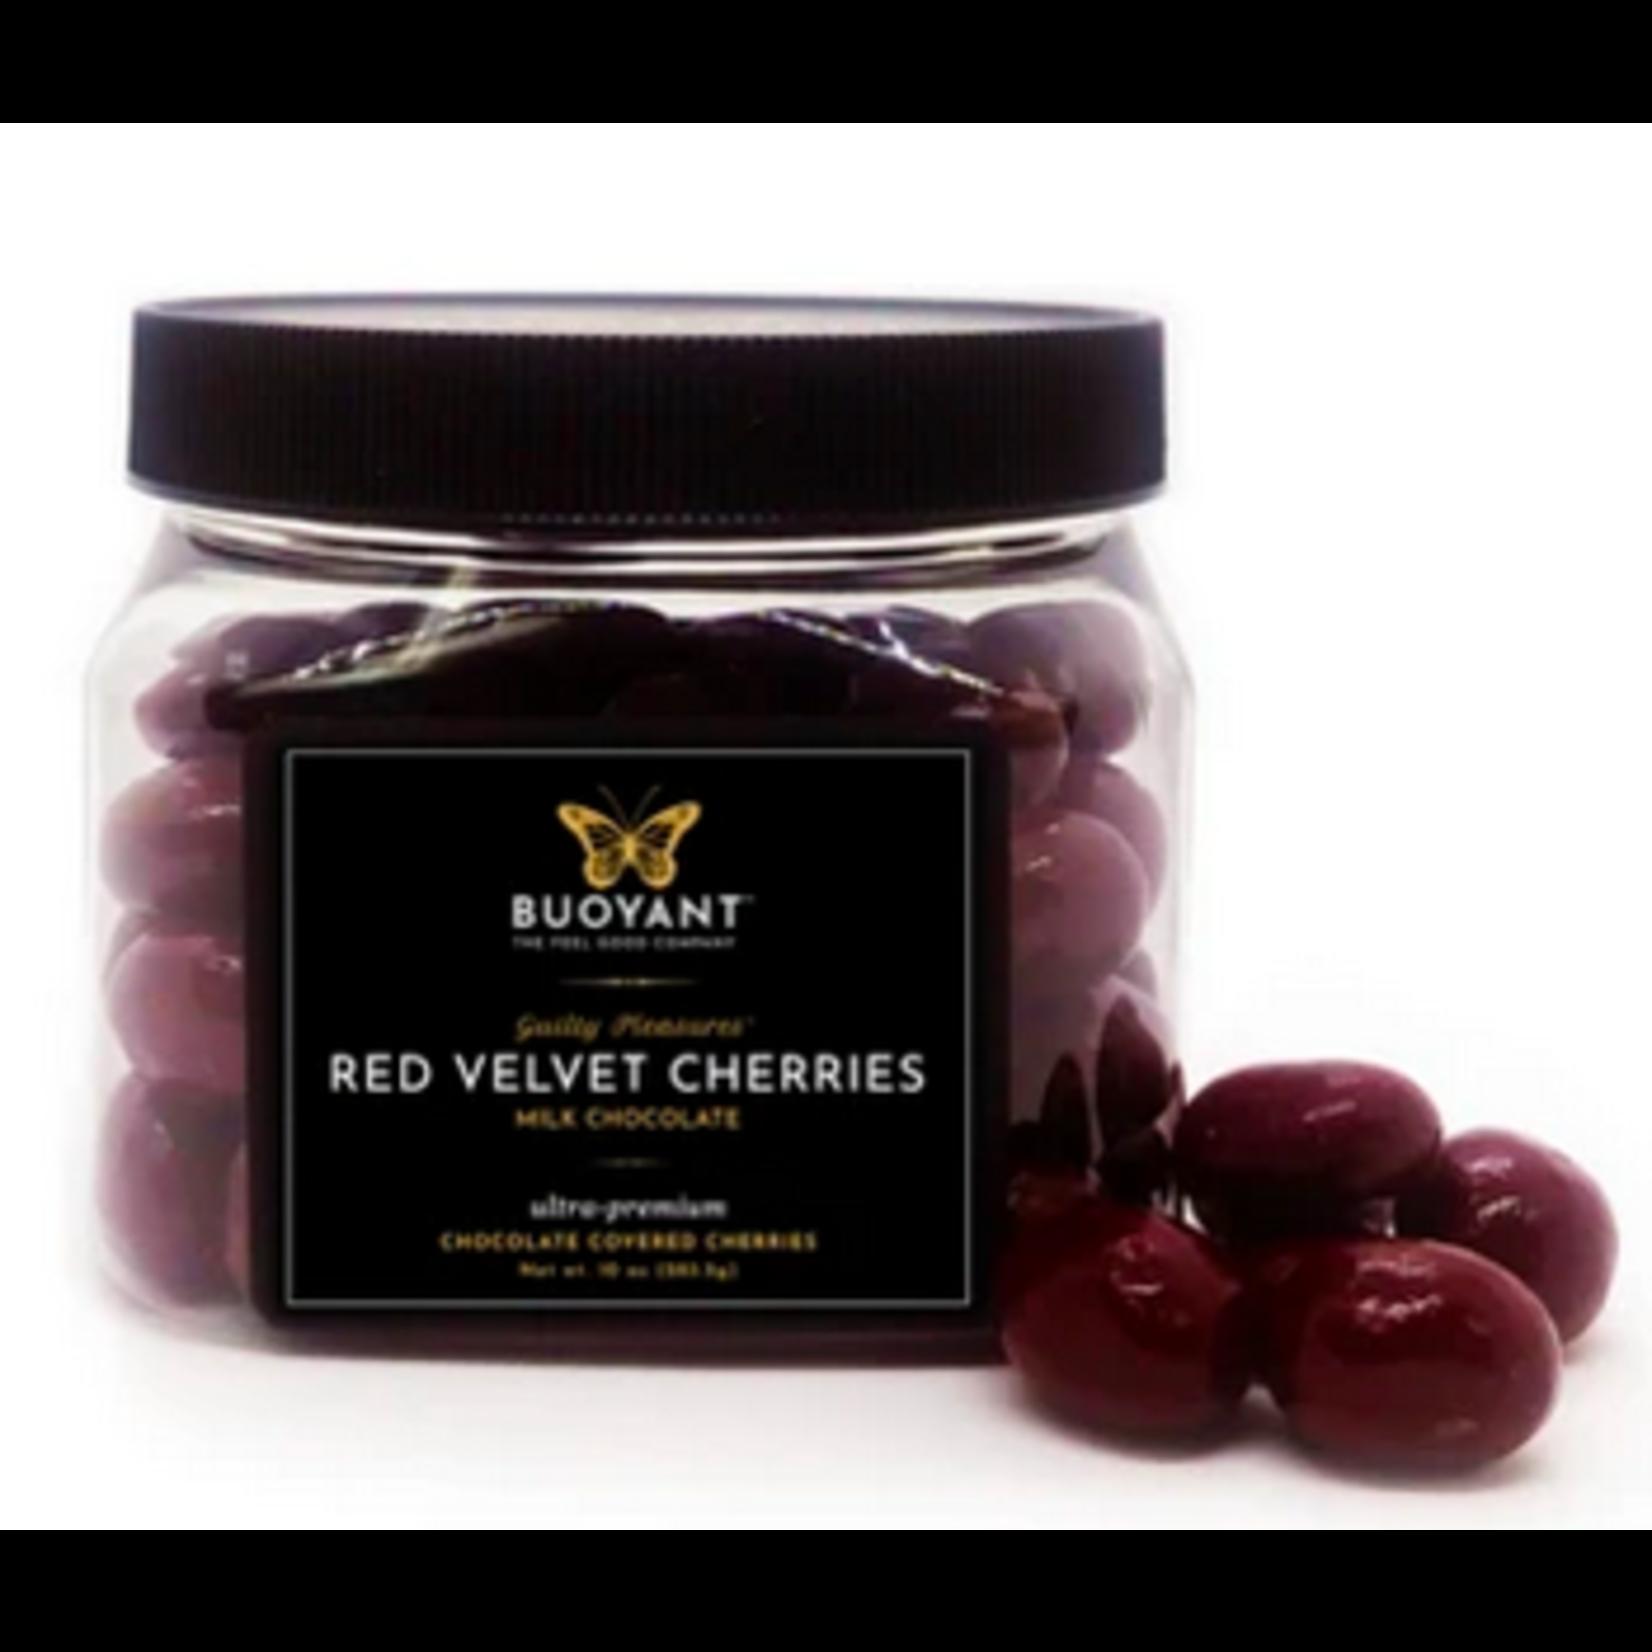 Buoyant Brands Buoyant Red Velvet Cherries - Milk Chocolate